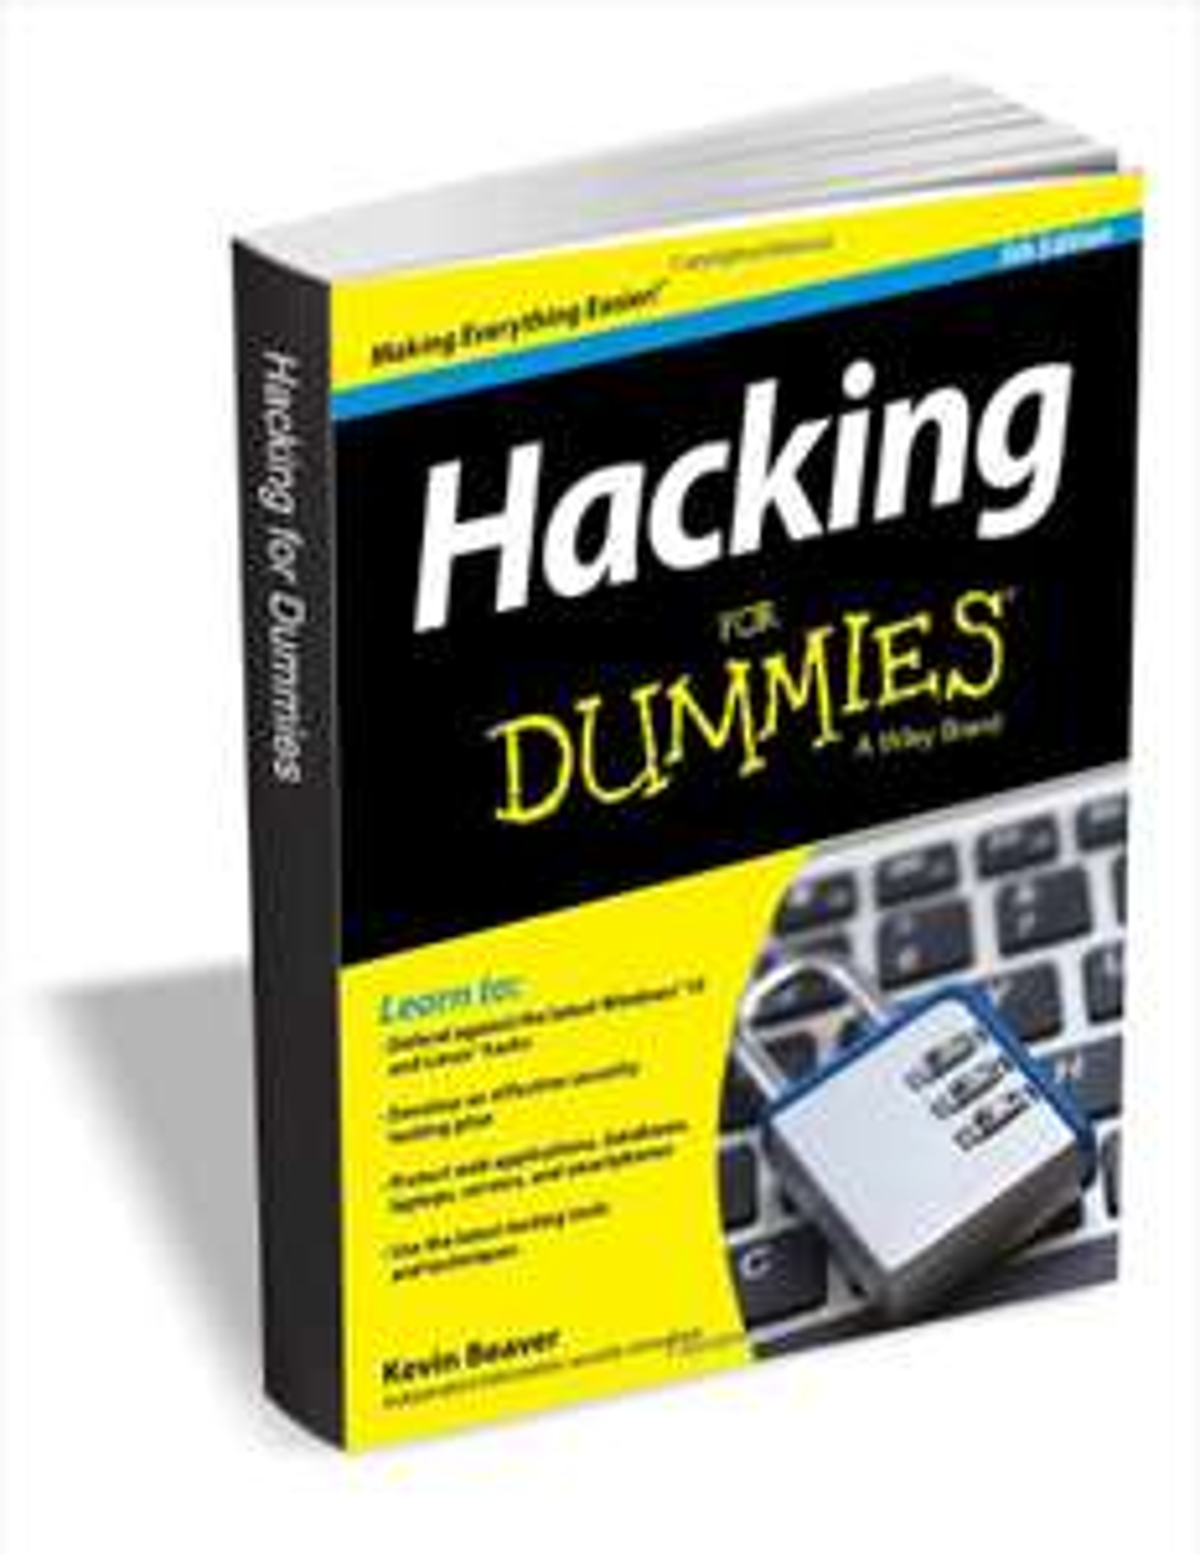 Hacking For Dummies (eBook) gratis statt 20€